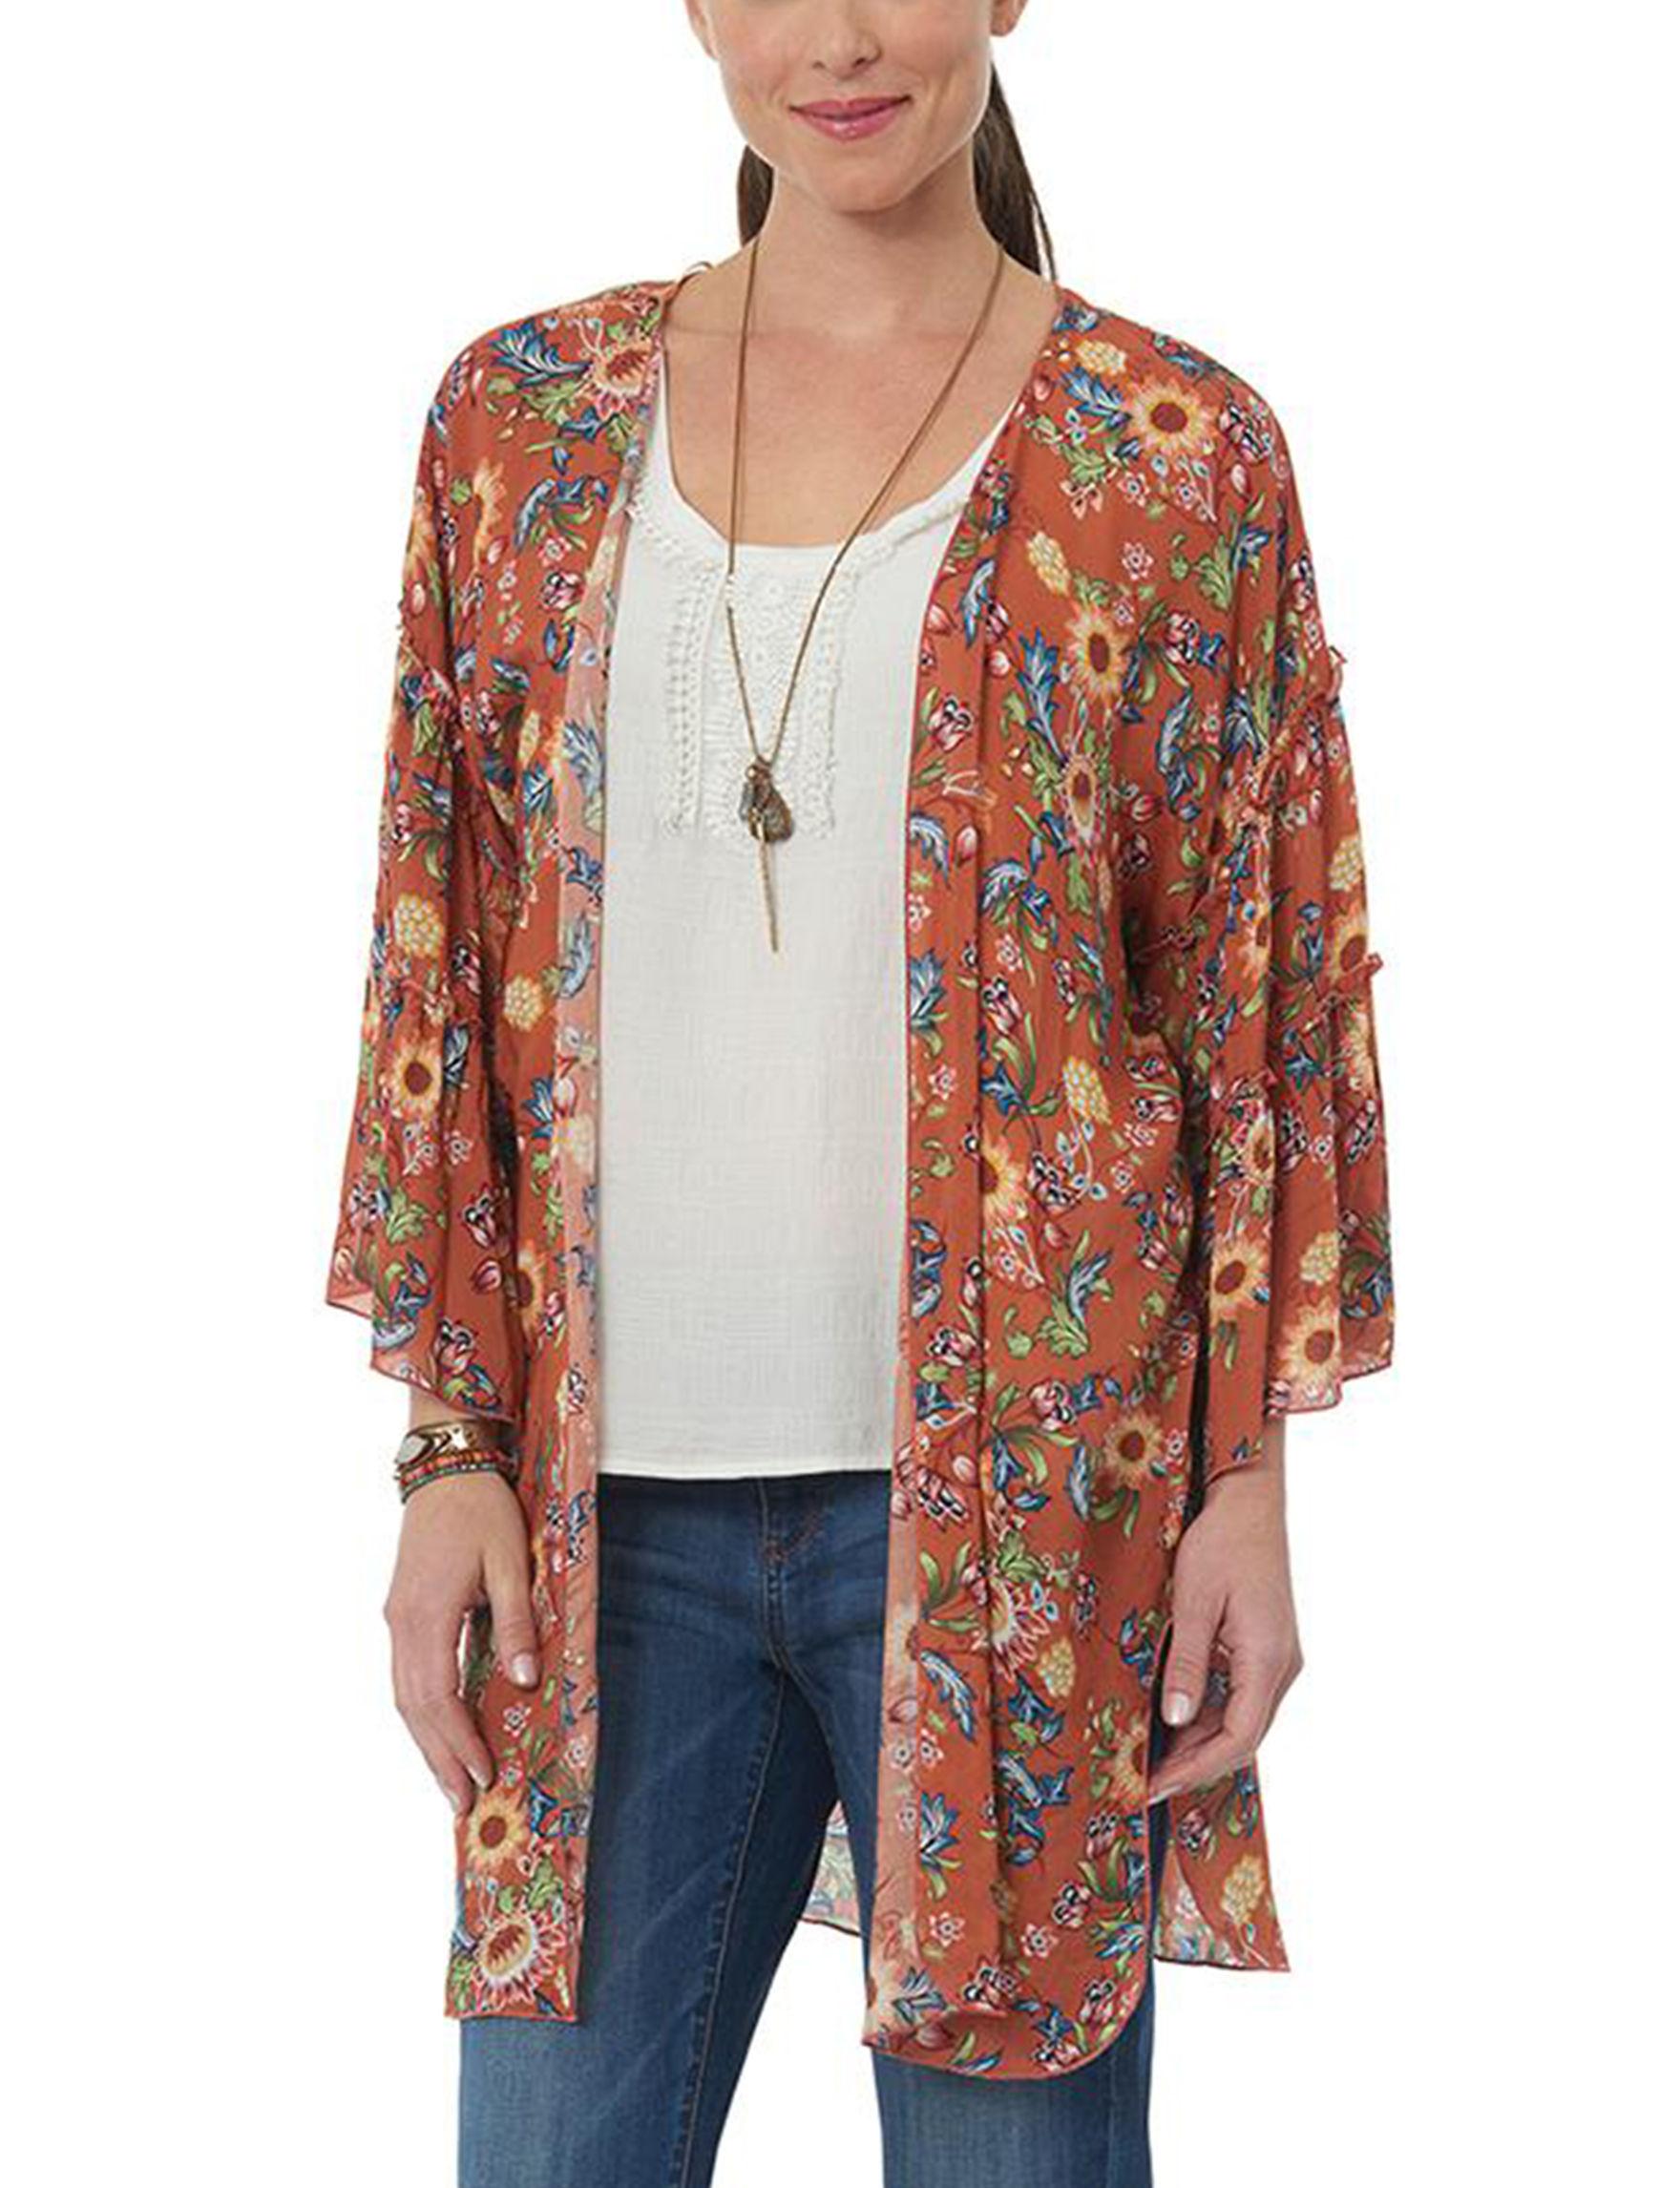 Democracy Apricot Kimonos & Toppers